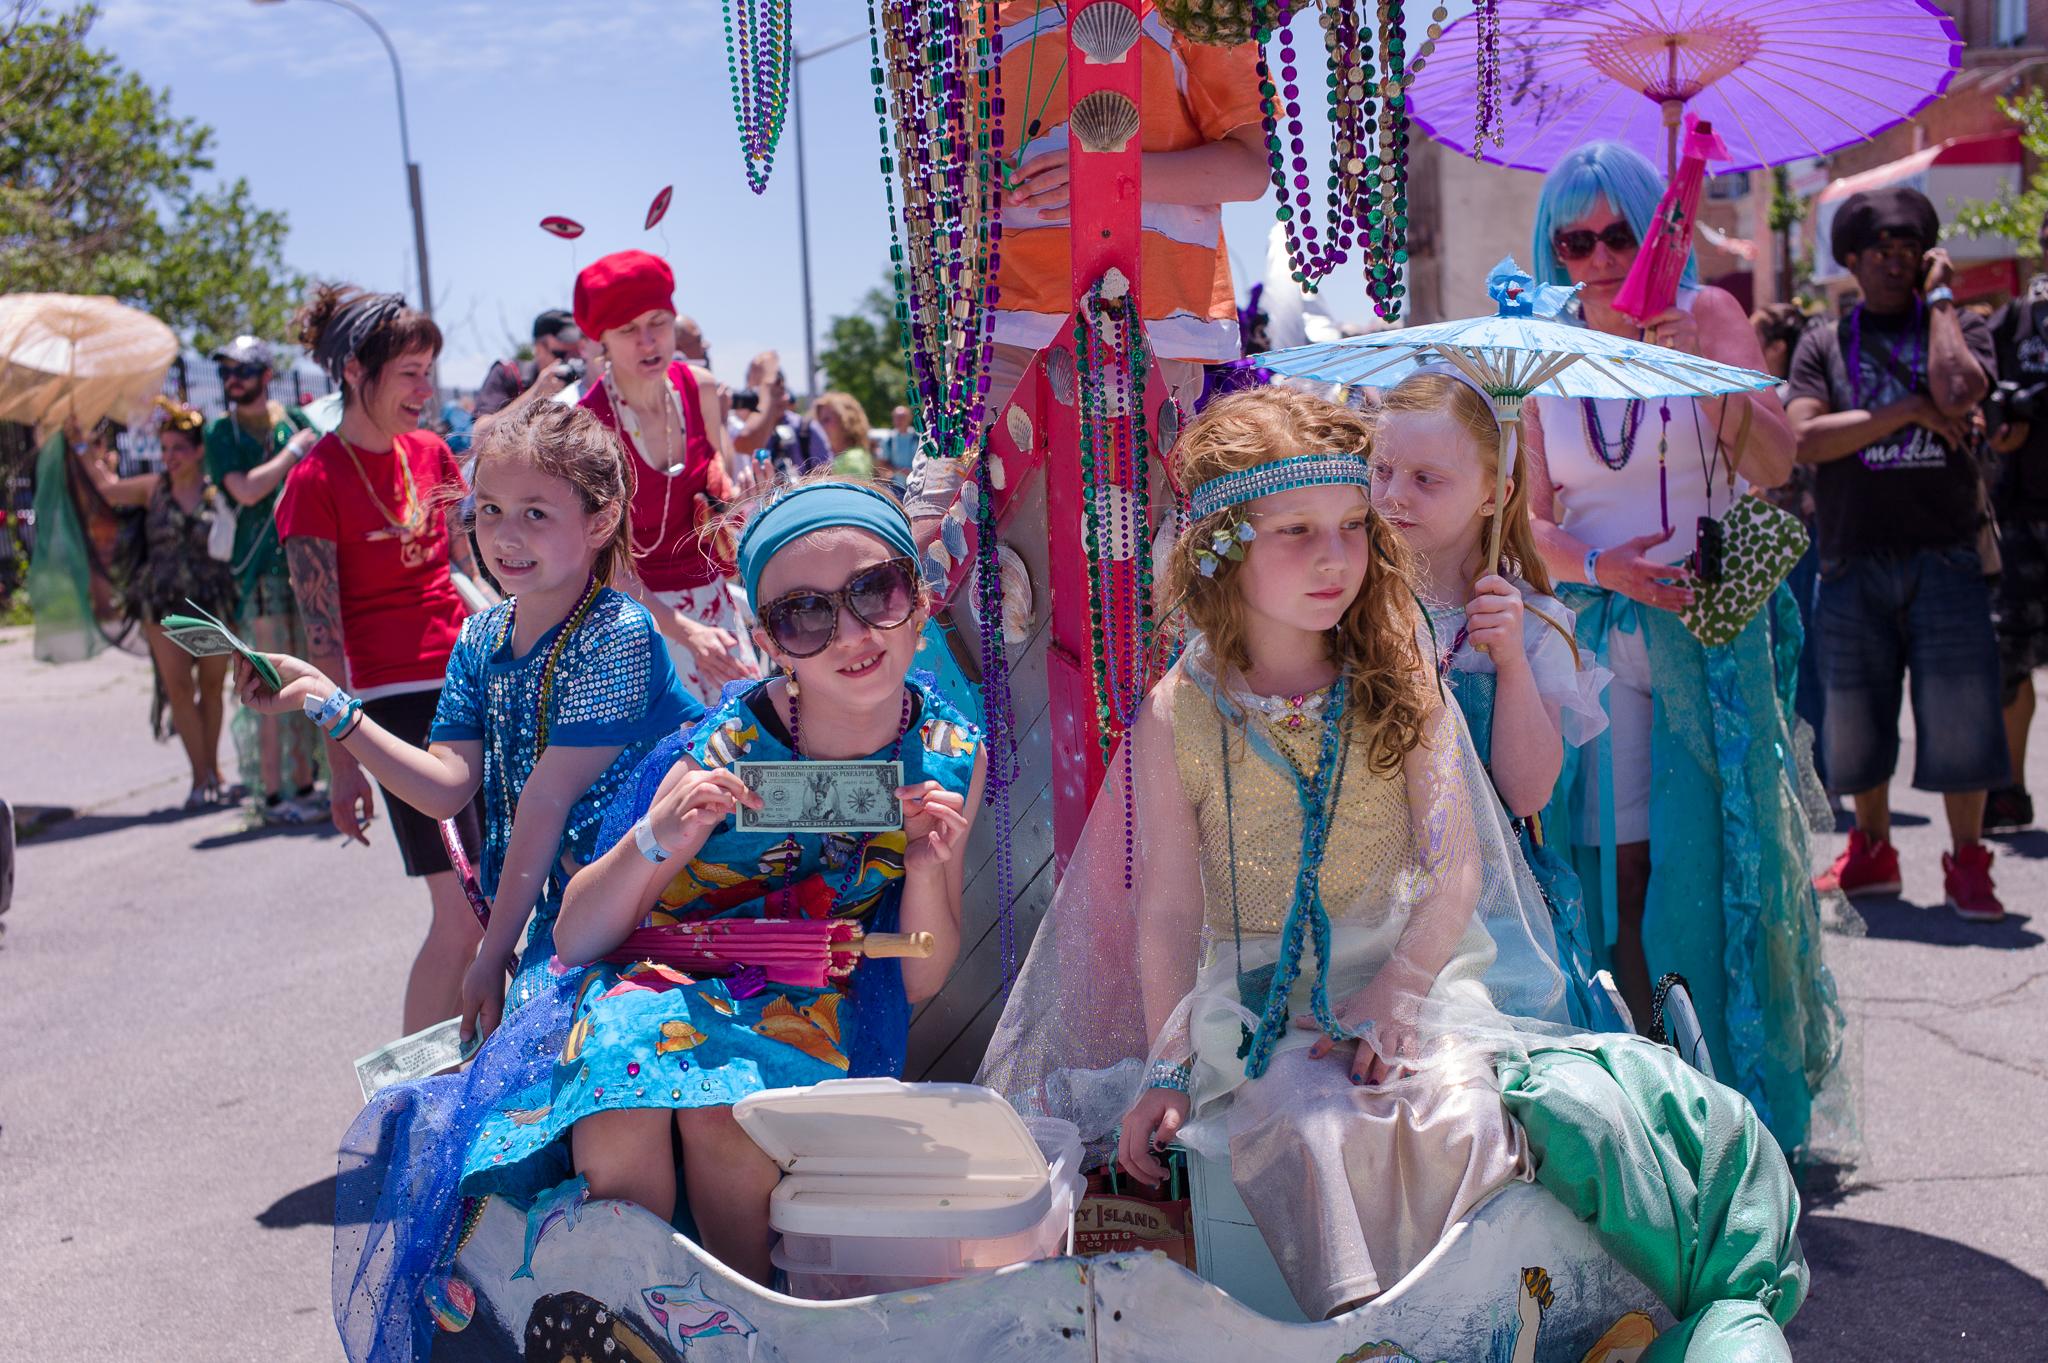 mermaid_parade_2014_007.jpg